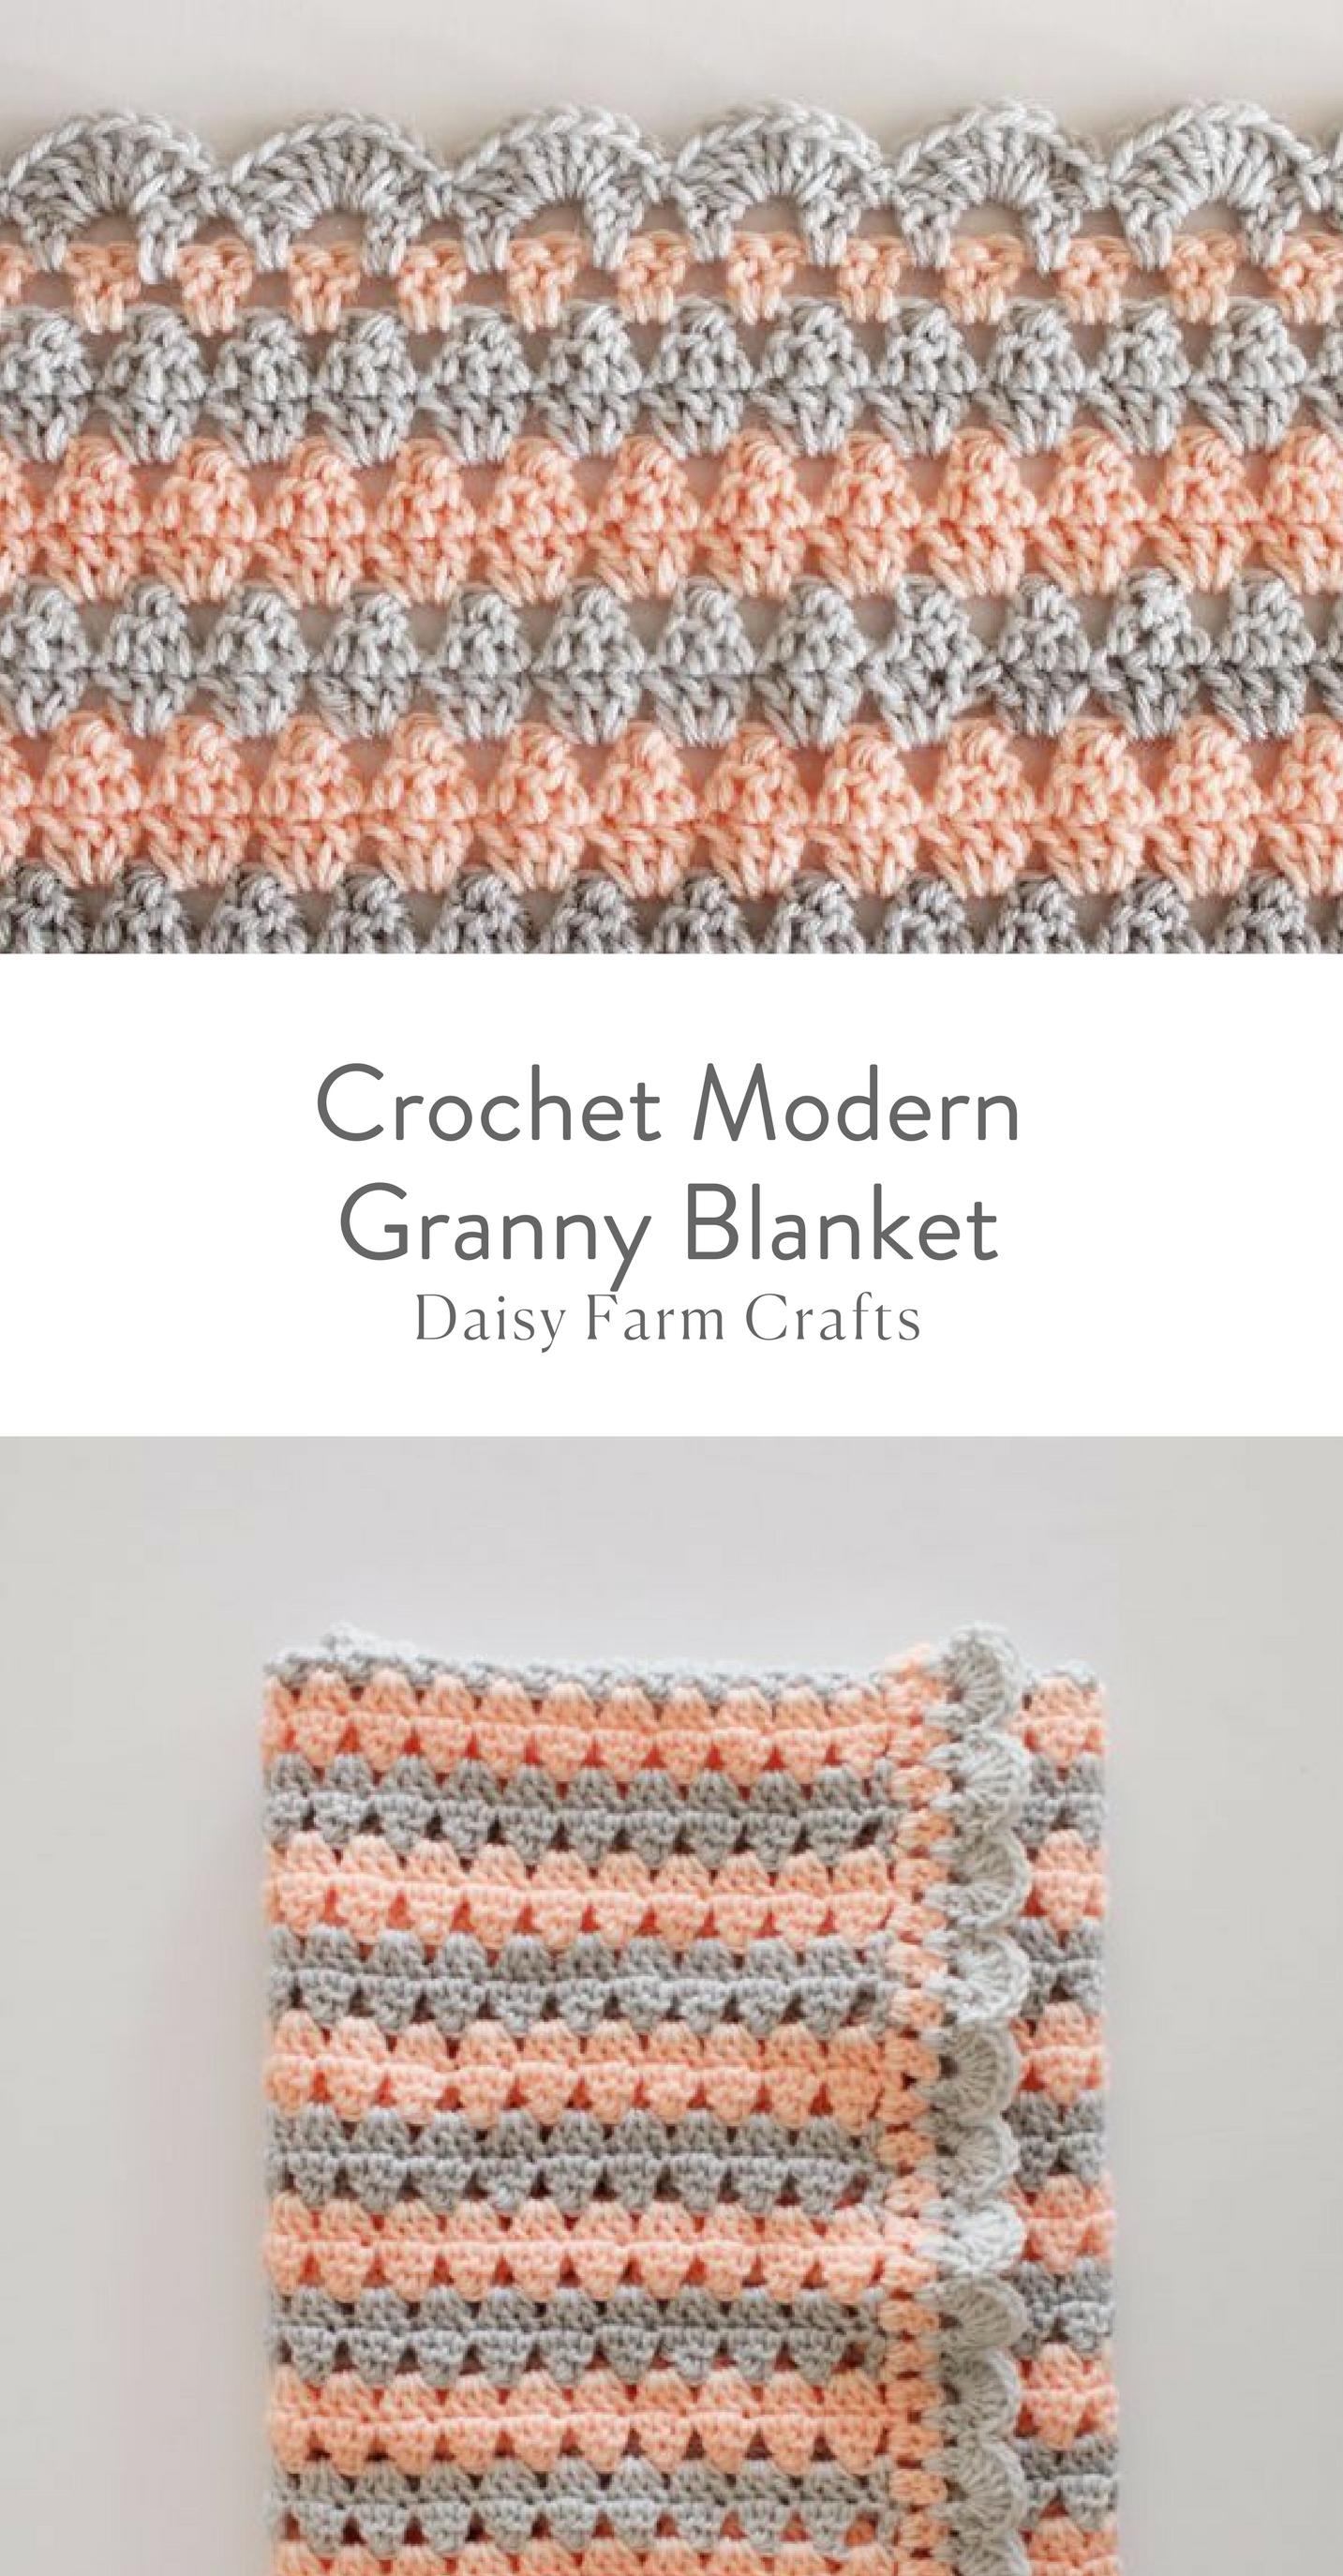 Free Pattern - Crochet Modern Granny Blanket | Crochet Patterns ...